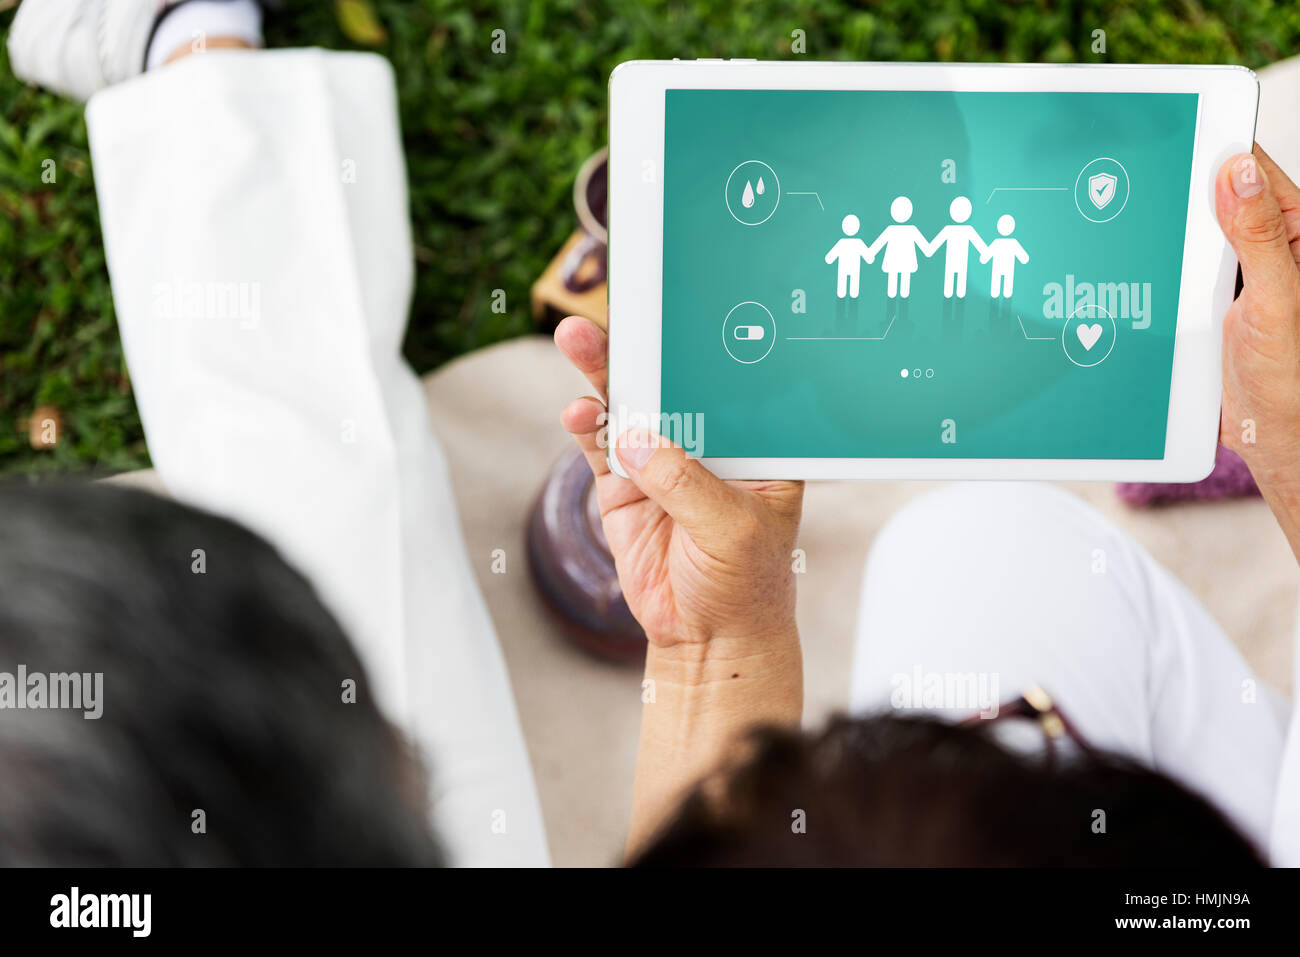 centrelink online application for family assisstance